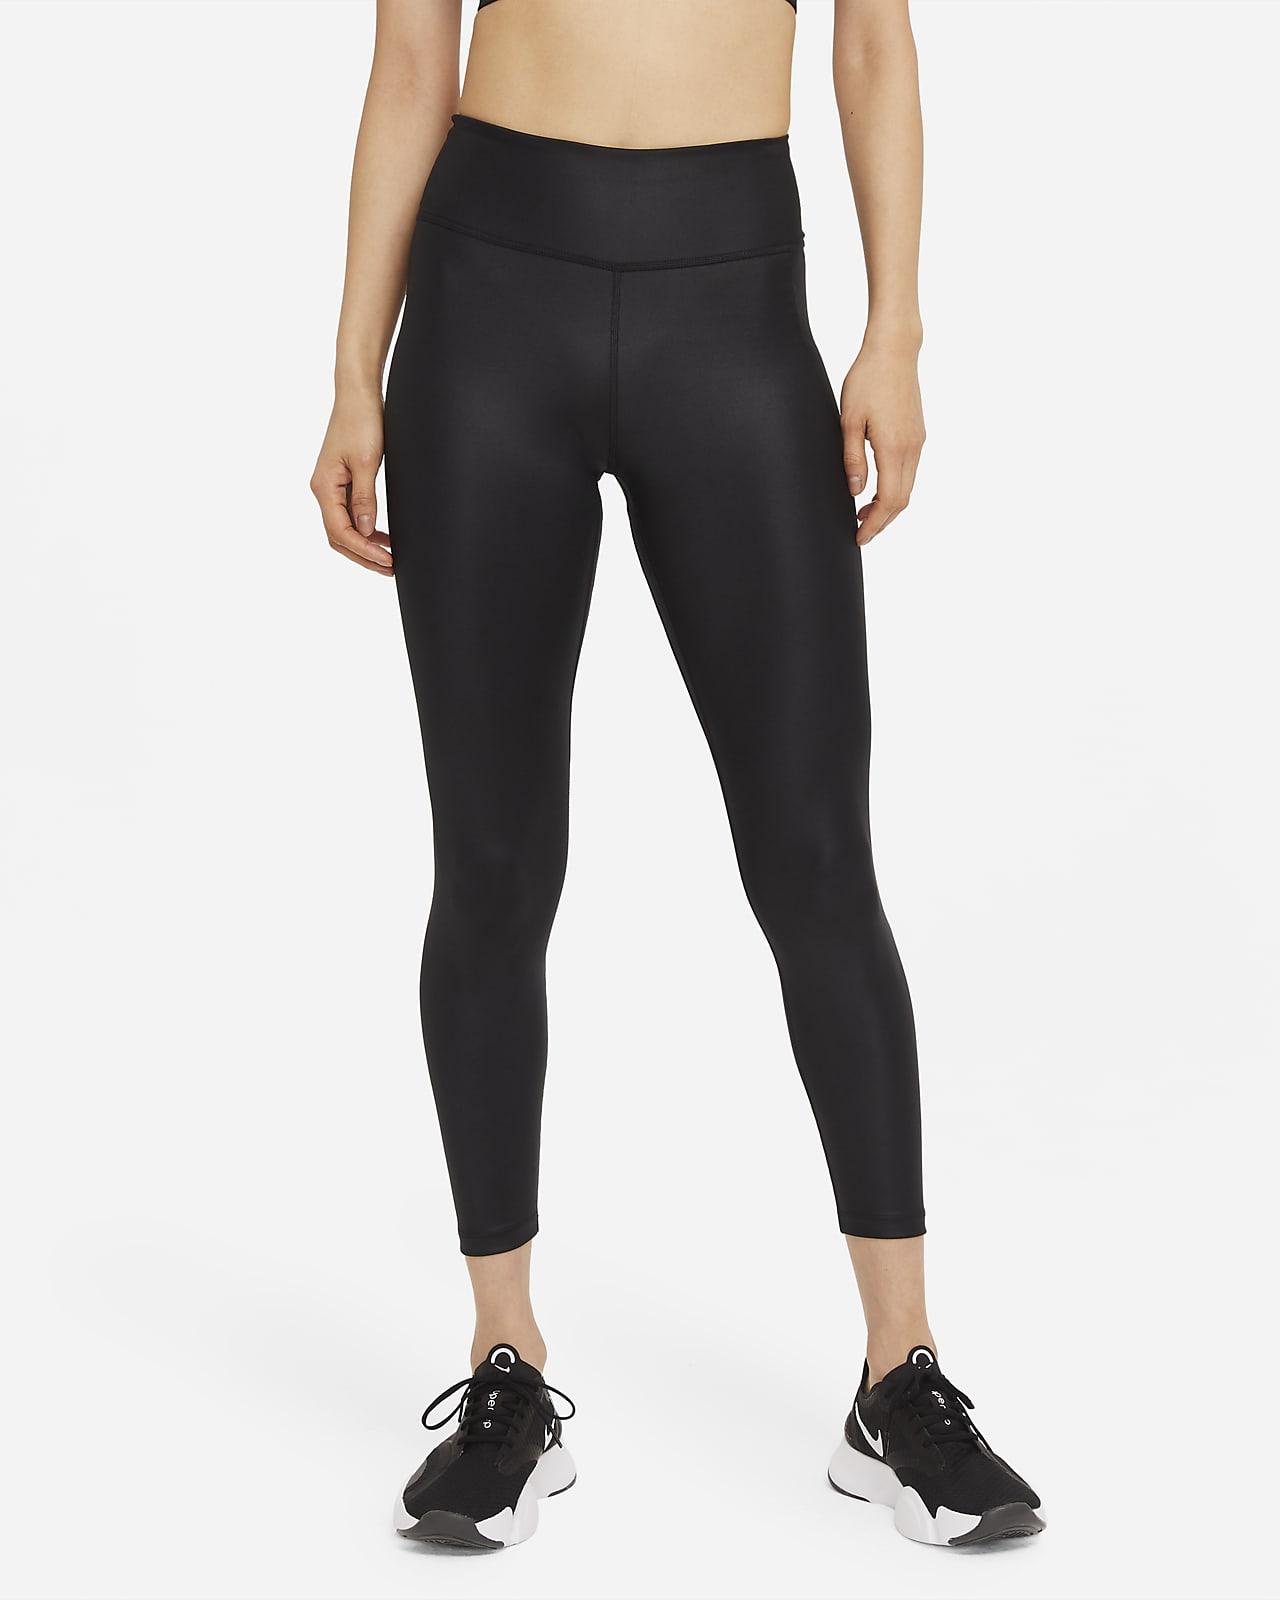 Nike One Women's Mid-Rise 7/8 Faux-Leather Leggings.